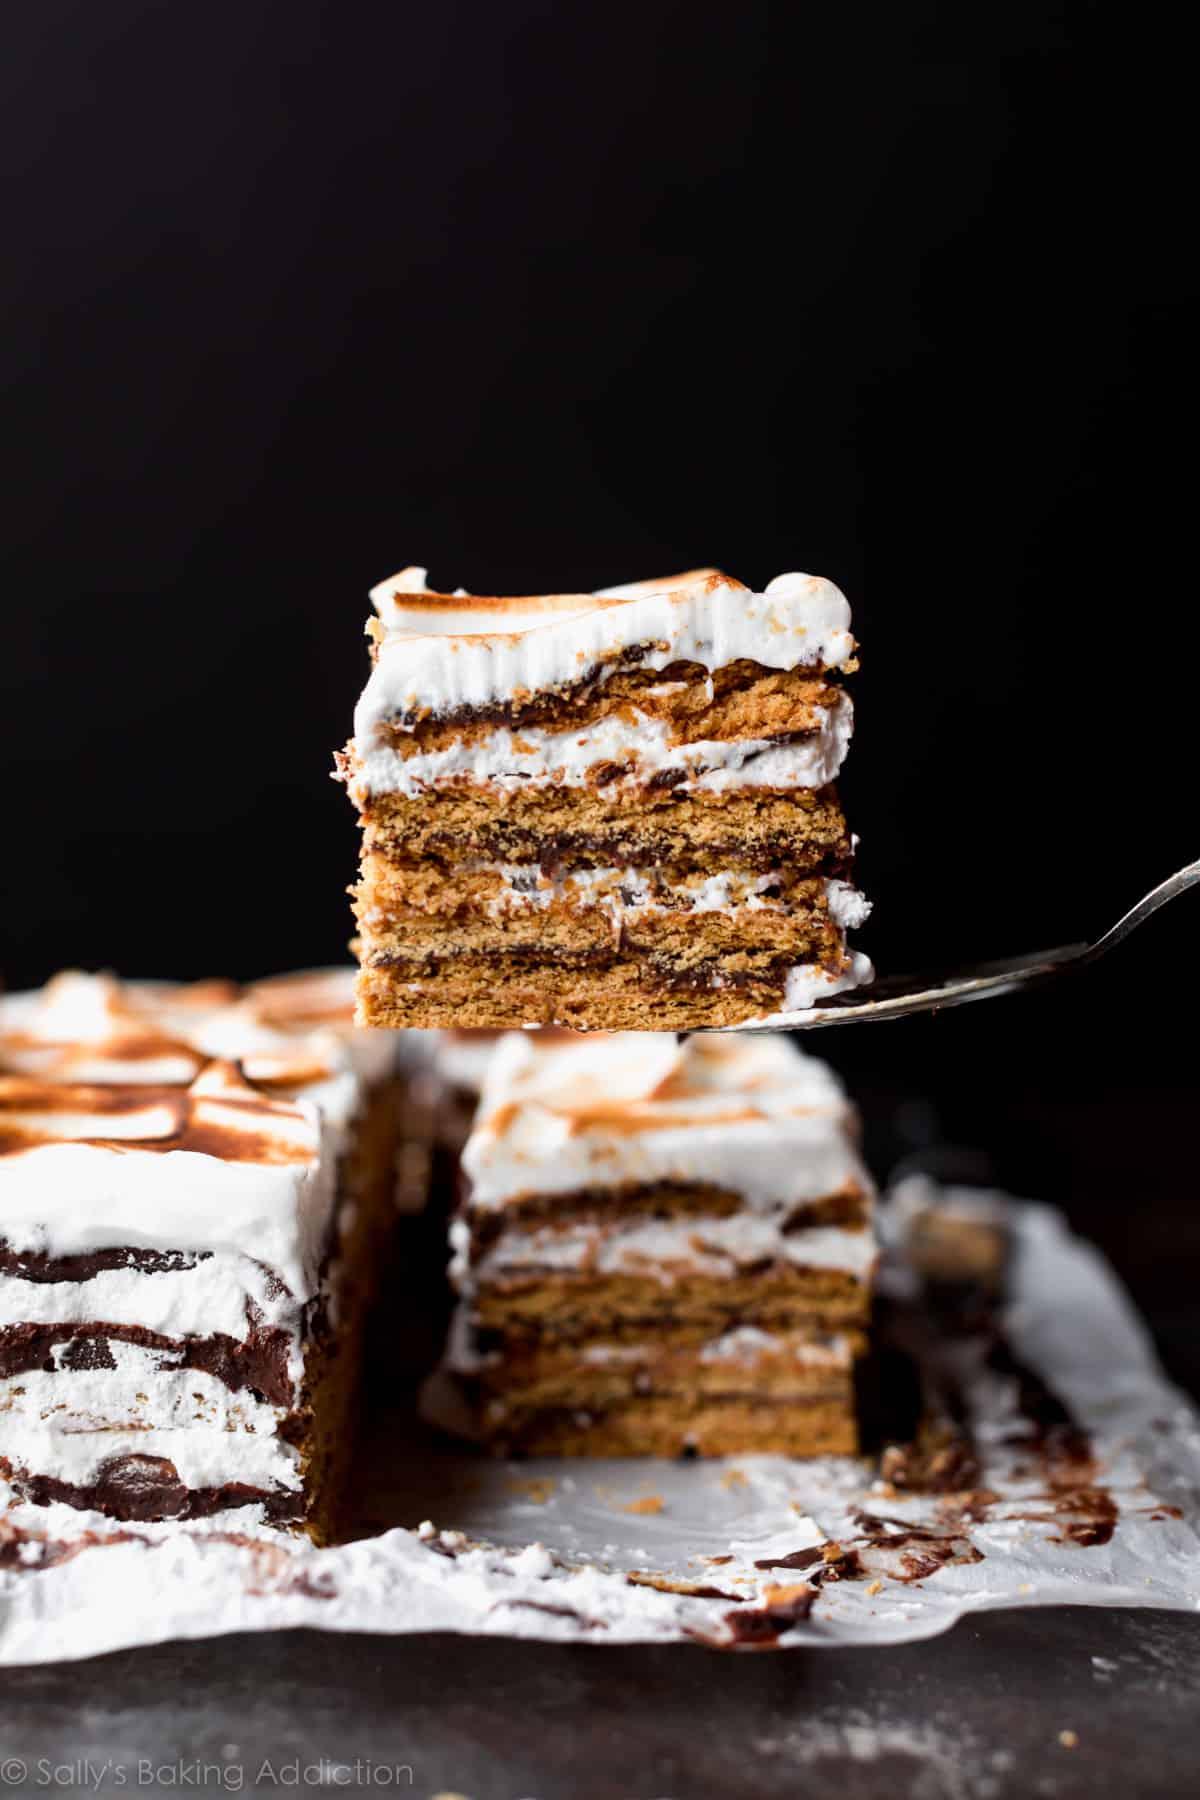 No-bake s'mores cake has 14 layers including graham cracker, chocolate ganache, and marshmallow meringue! Recipe on sallysbakingaddiction.com